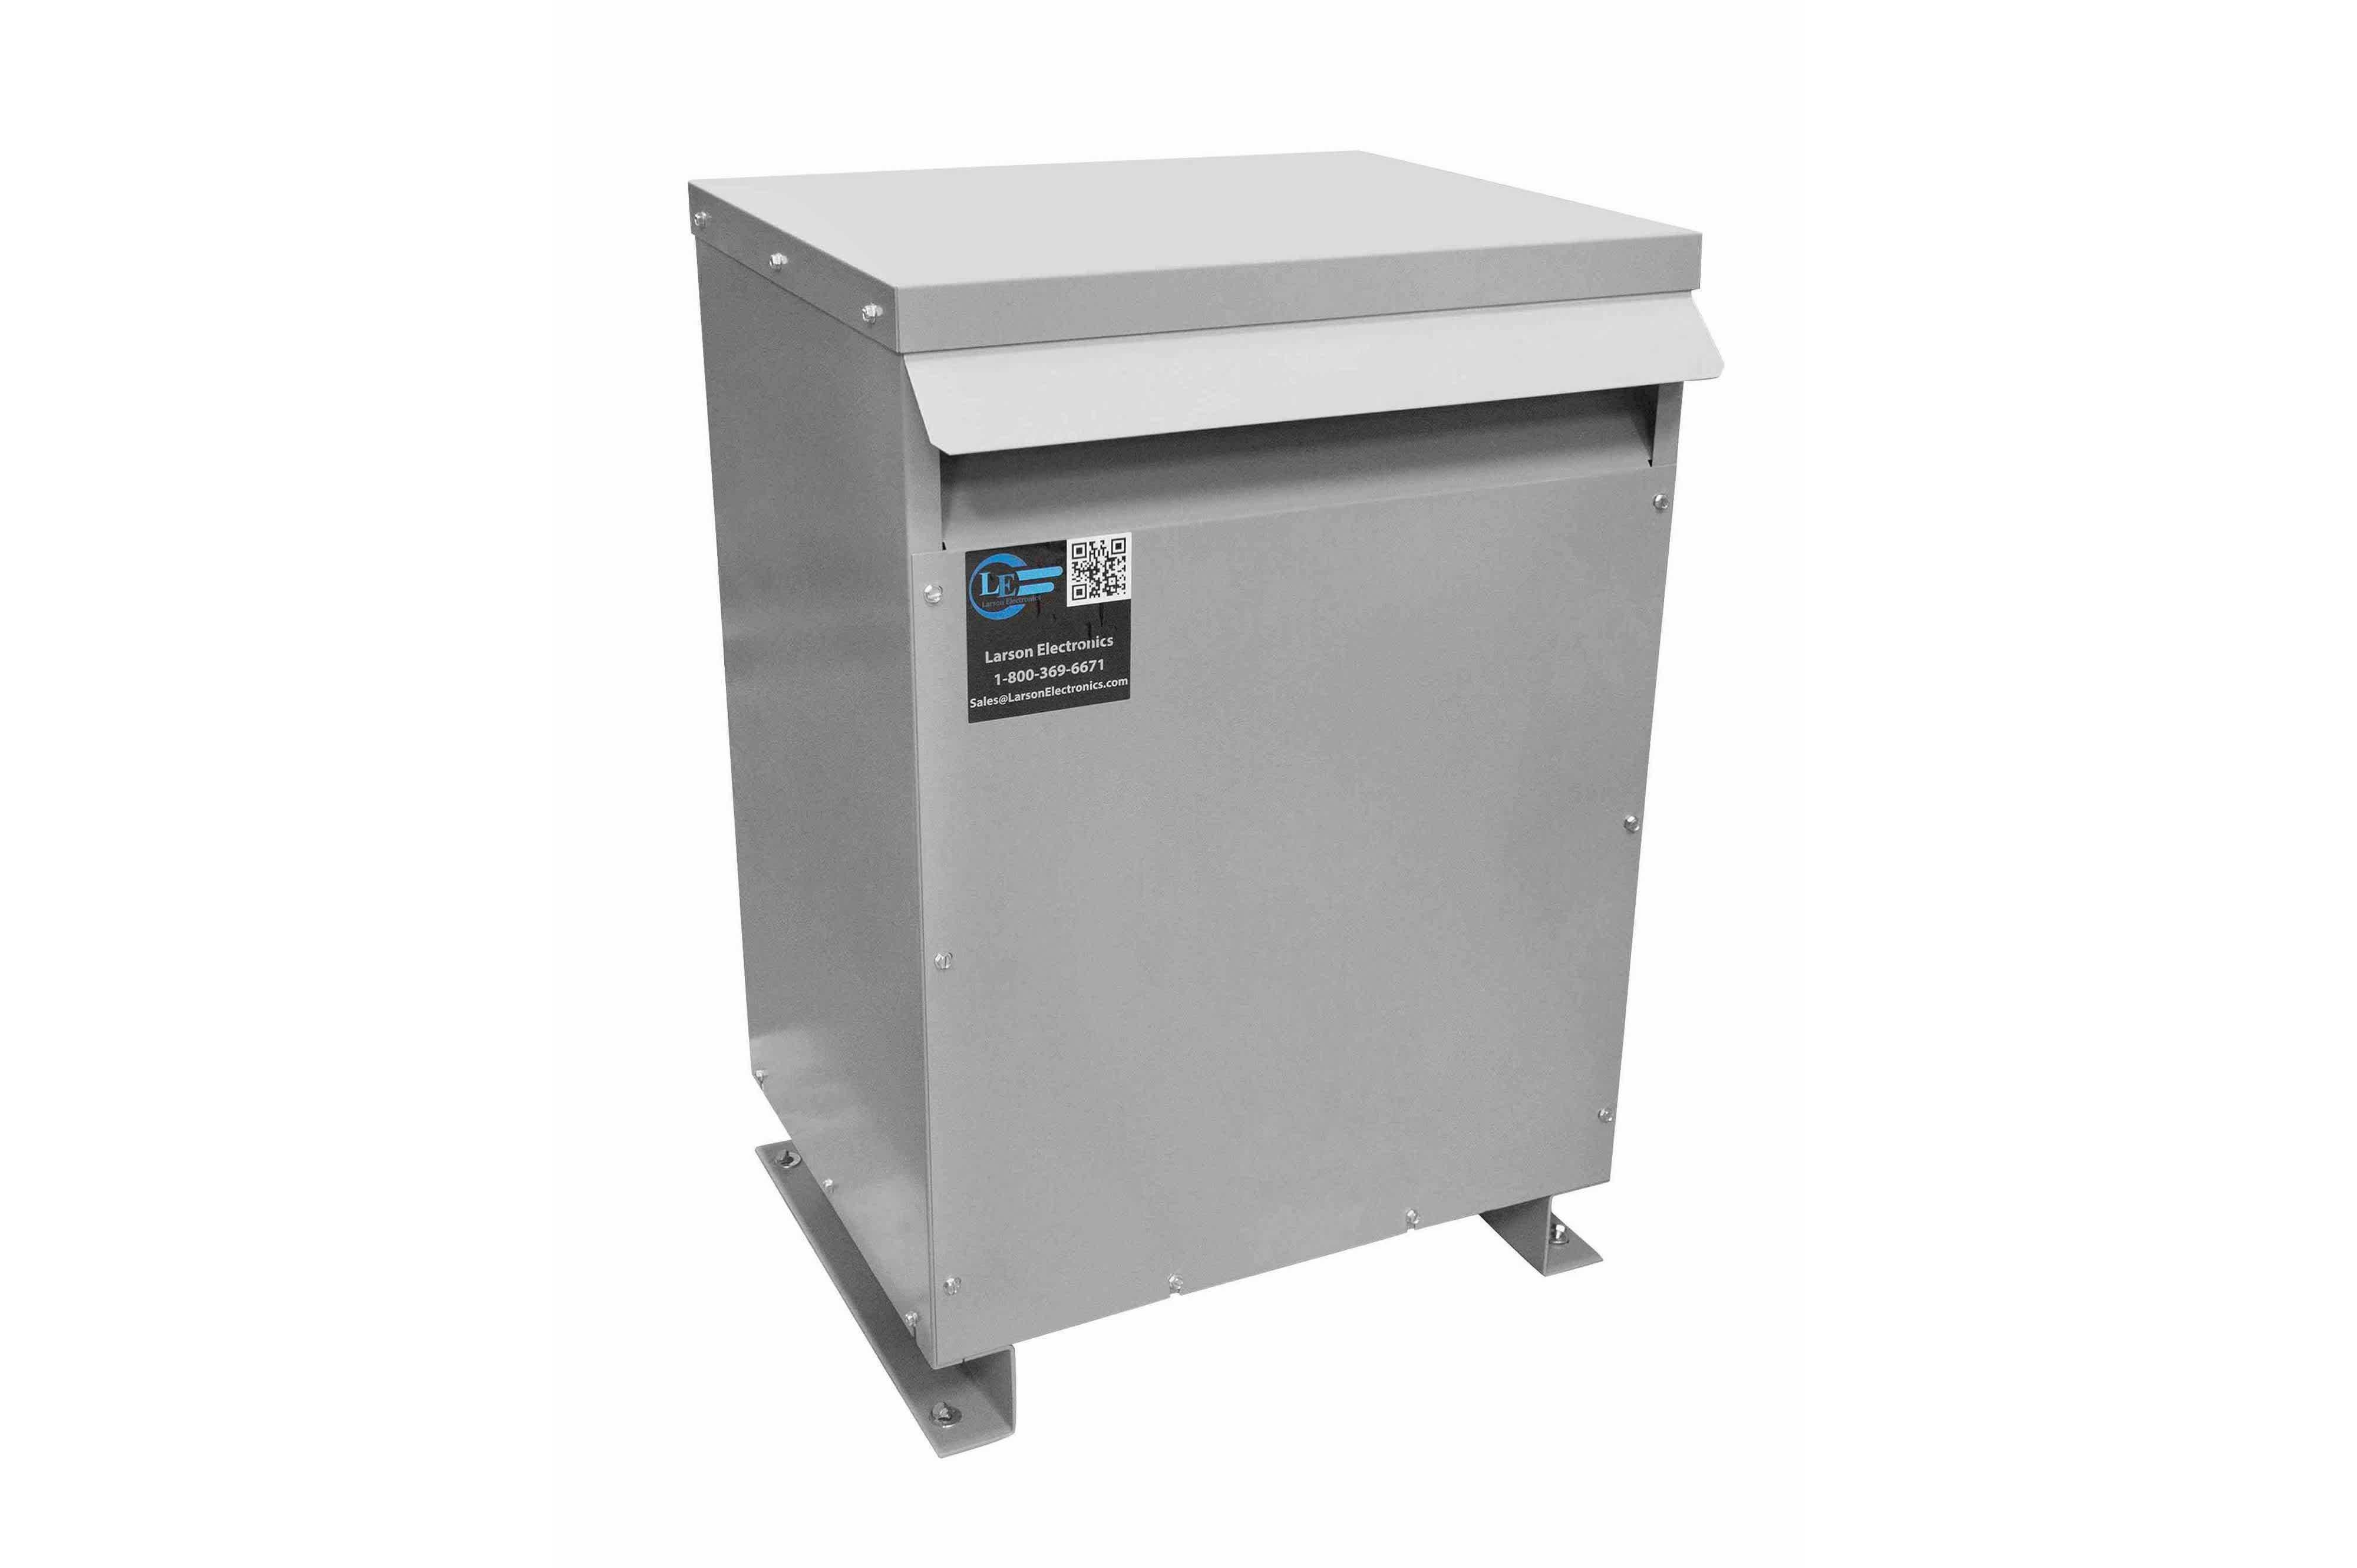 42.5 kVA 3PH Isolation Transformer, 400V Wye Primary, 600Y/347 Wye-N Secondary, N3R, Ventilated, 60 Hz